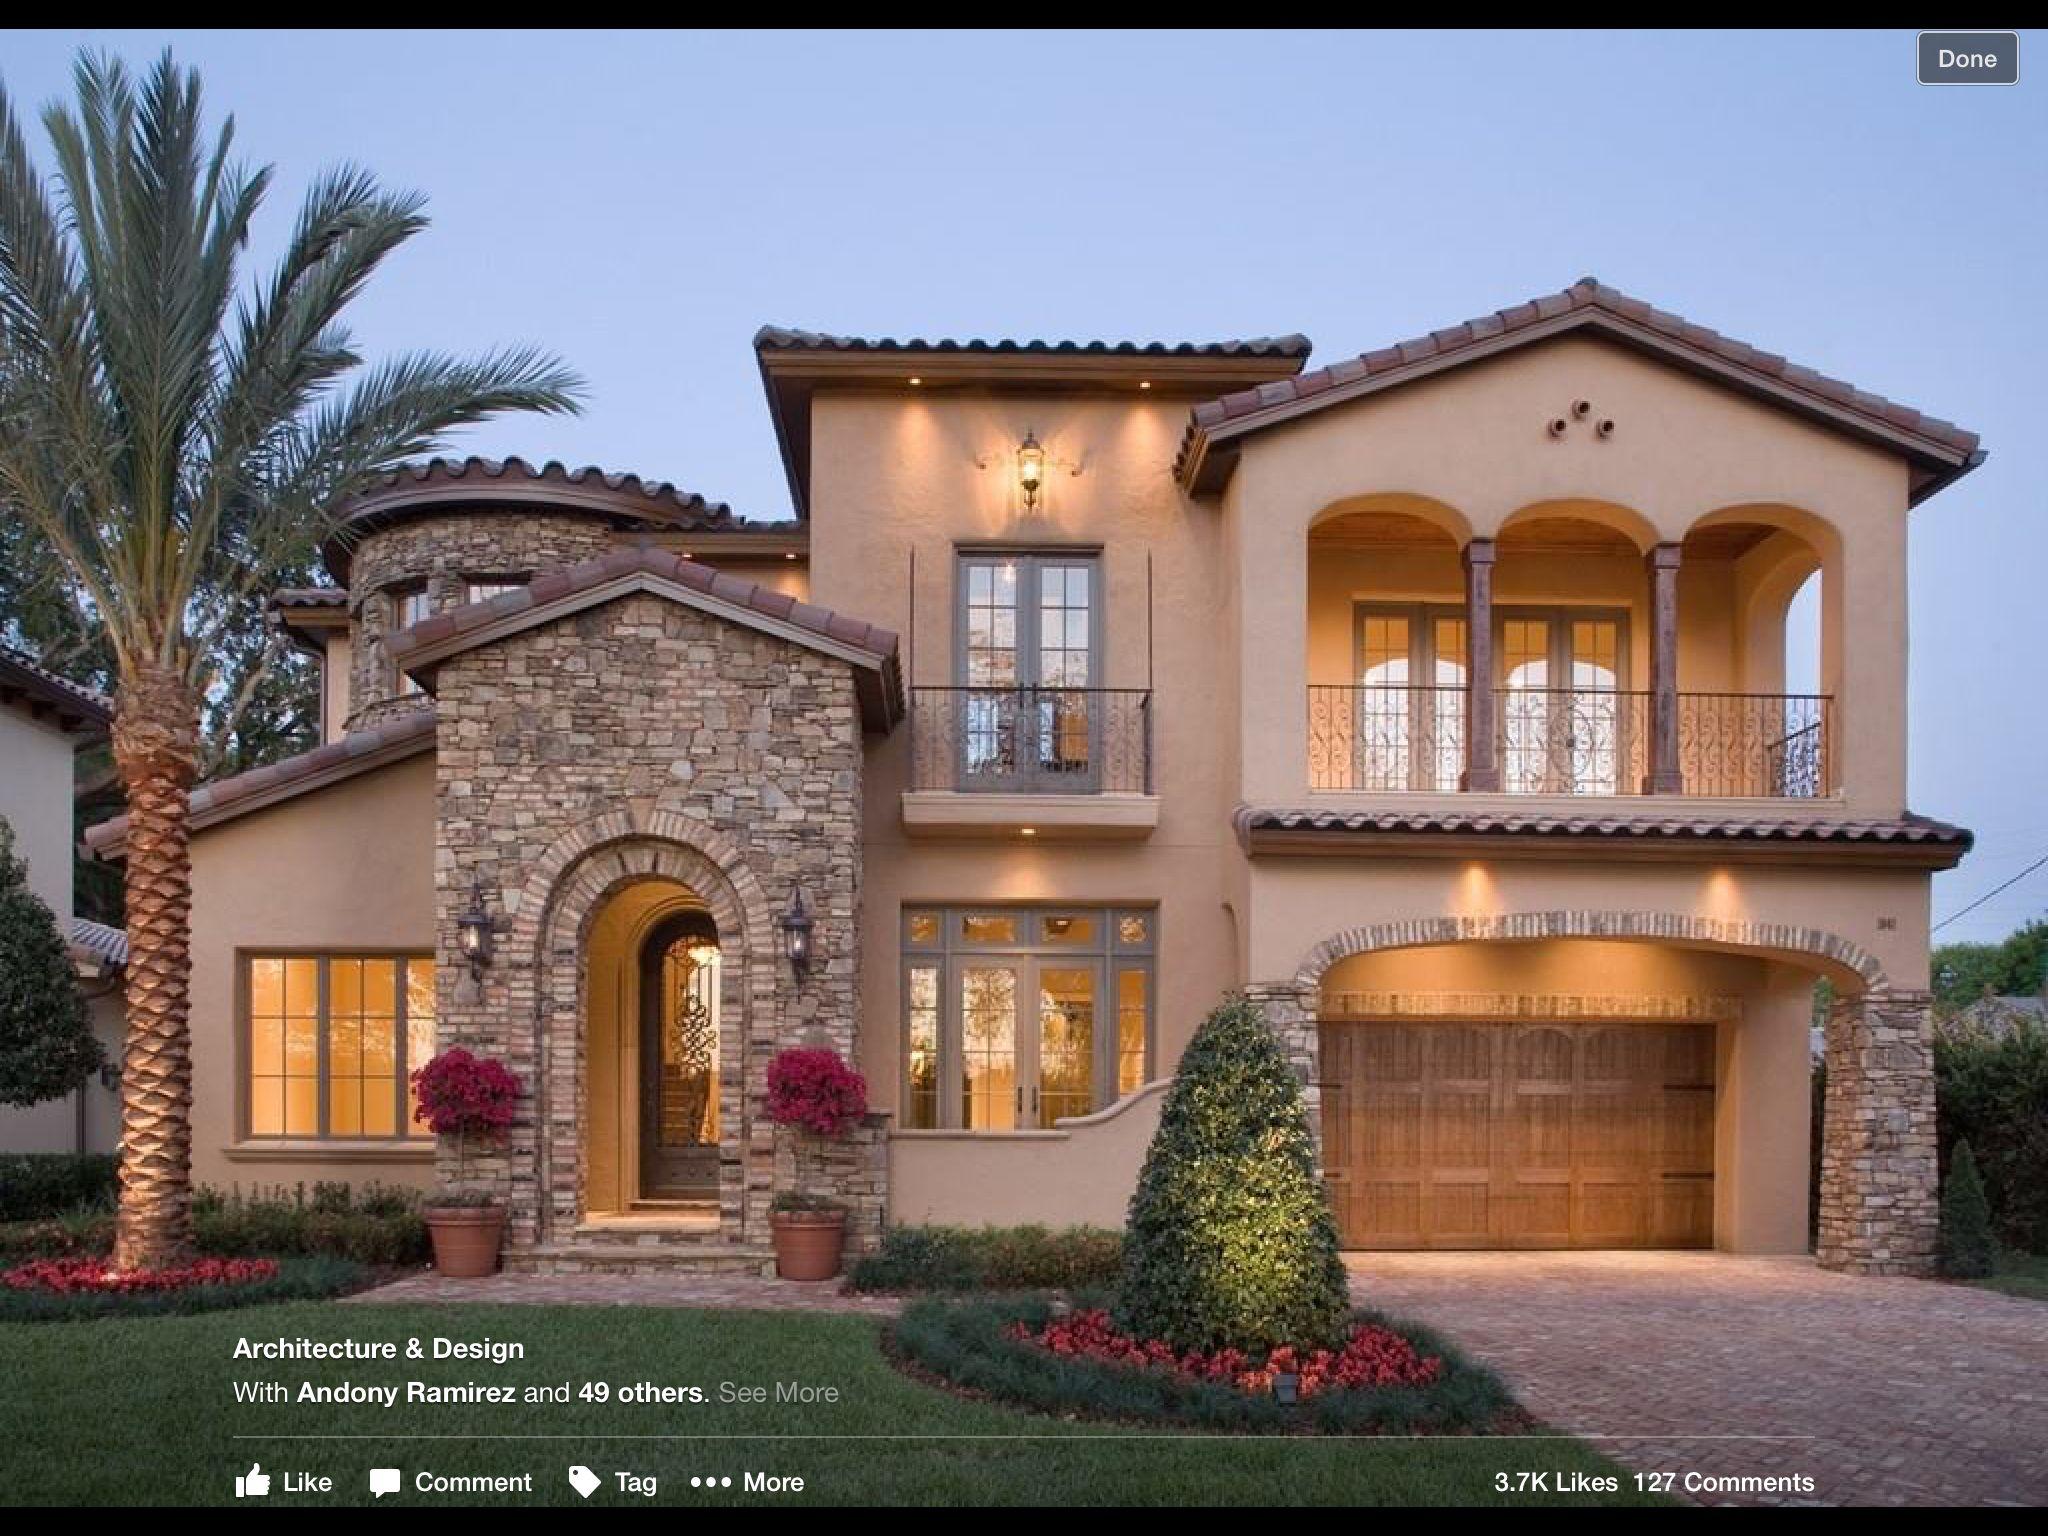 2 Storey House With Stone Entrance Mediterranean House Plan Florida House Plans Mediterranean Homes